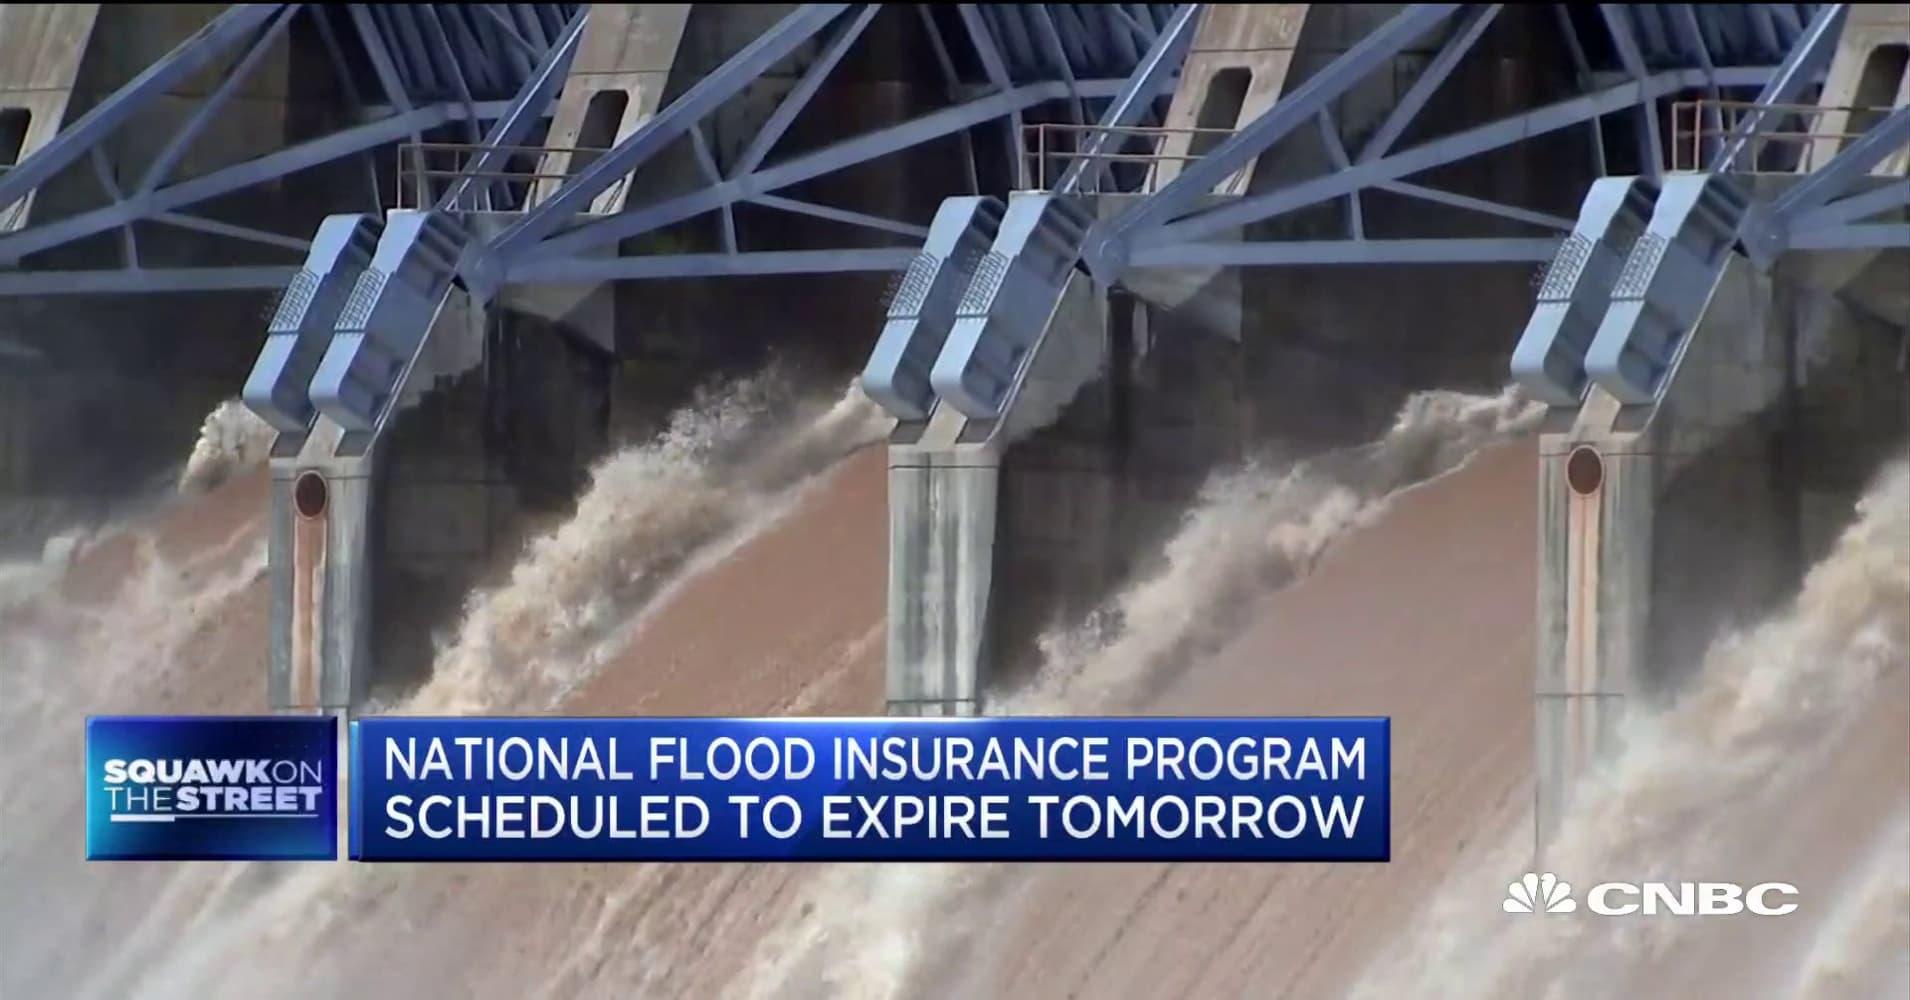 National Flood Insurance Program set to expire as hurricane season begins